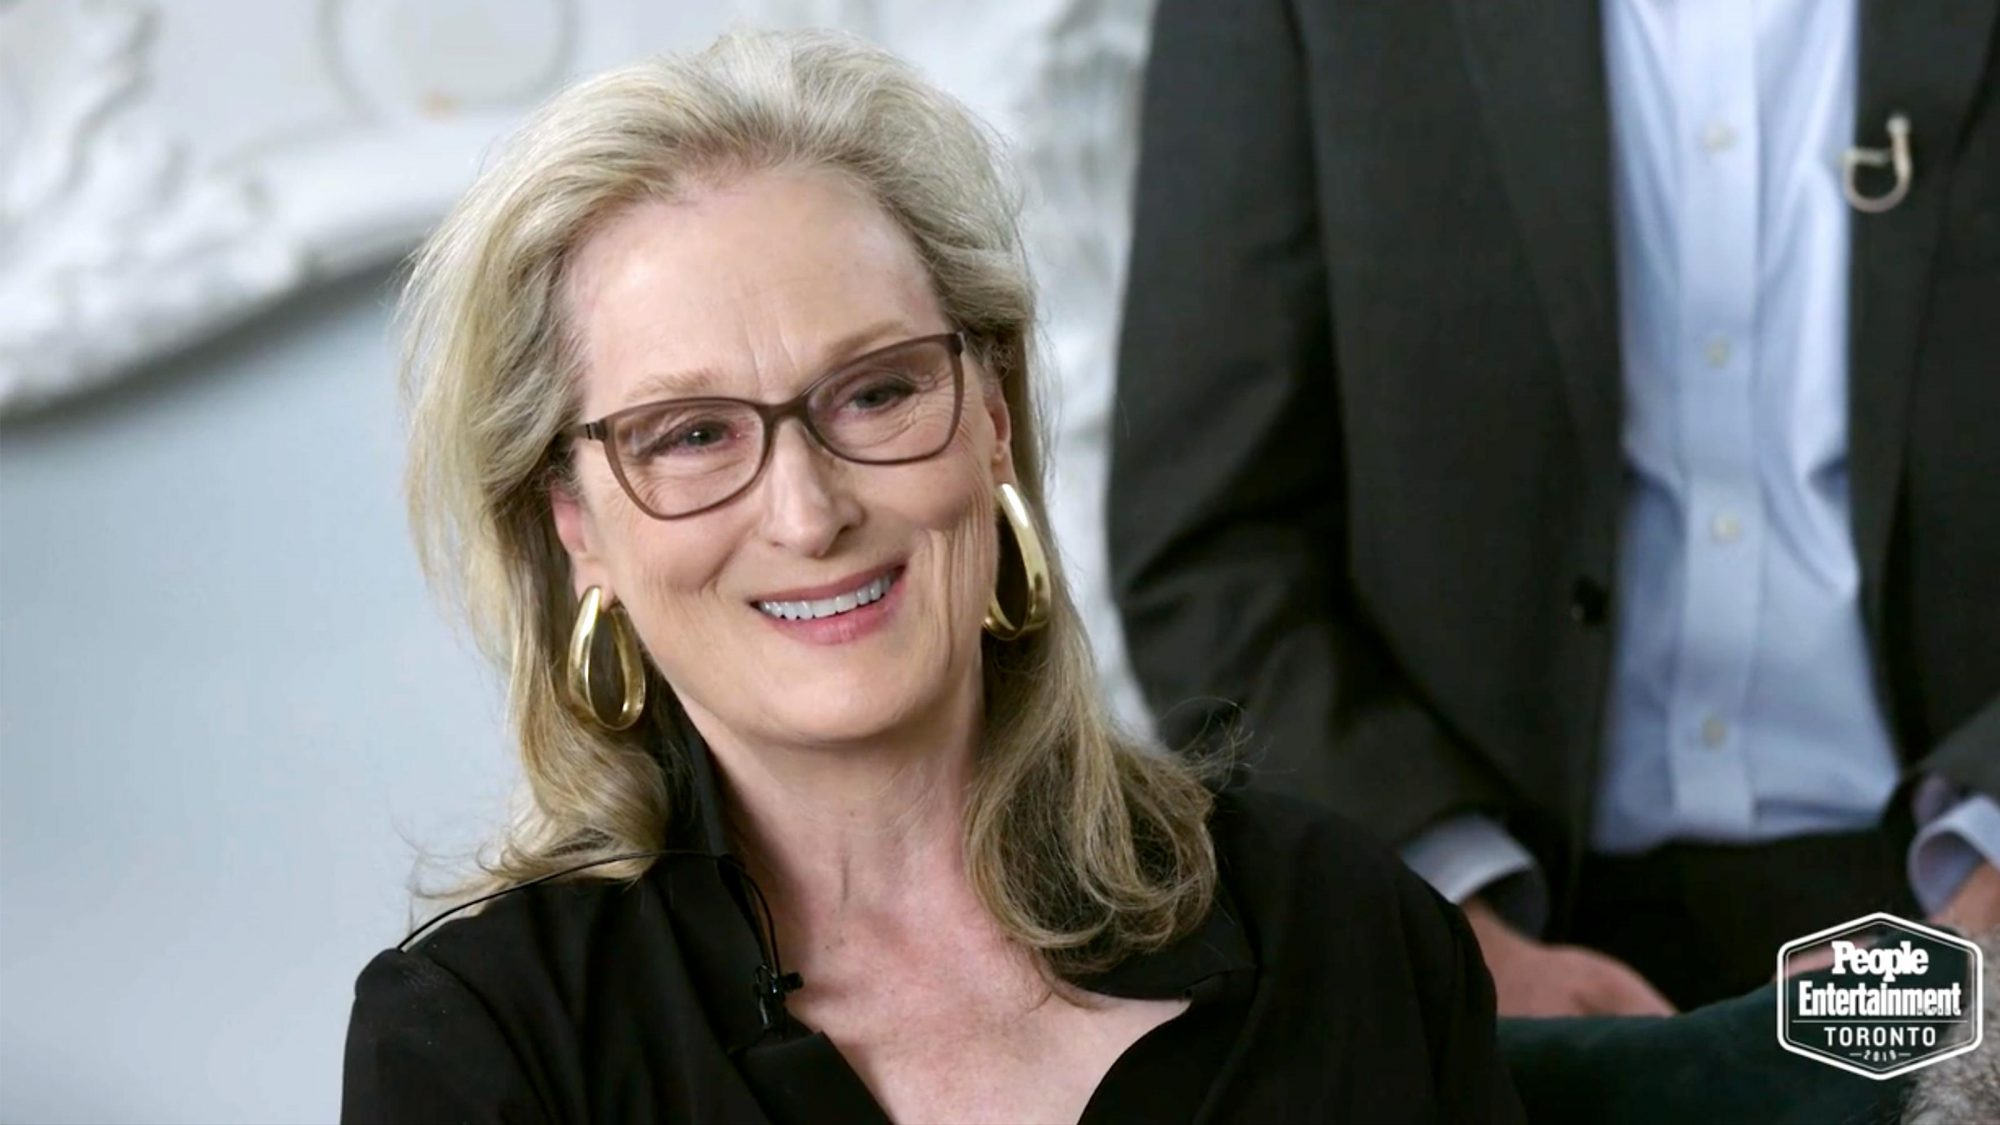 Meryl Streep The Laundromat TIFF Interview (screen grab)